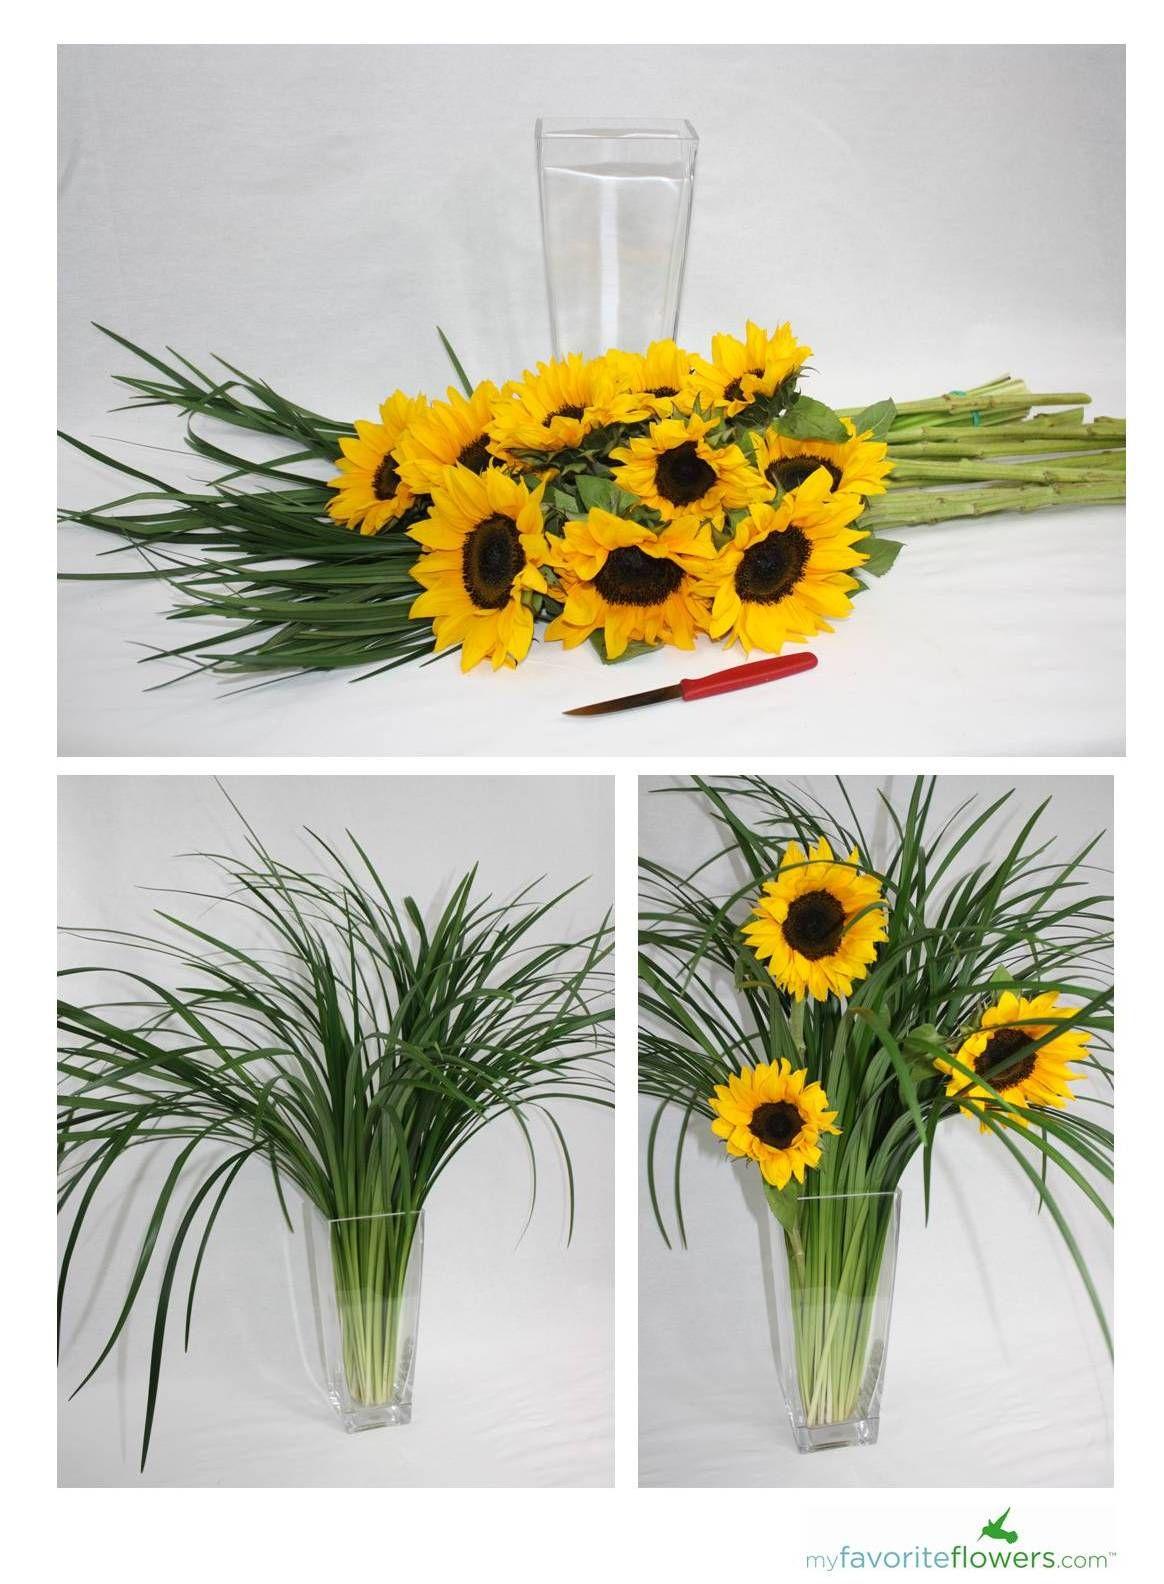 Myfavoriteflowers Sunflowers Jpg 1164 1584 Sunflower Arrangements Sunflower Floral Arrangements Flower Arrangements Diy